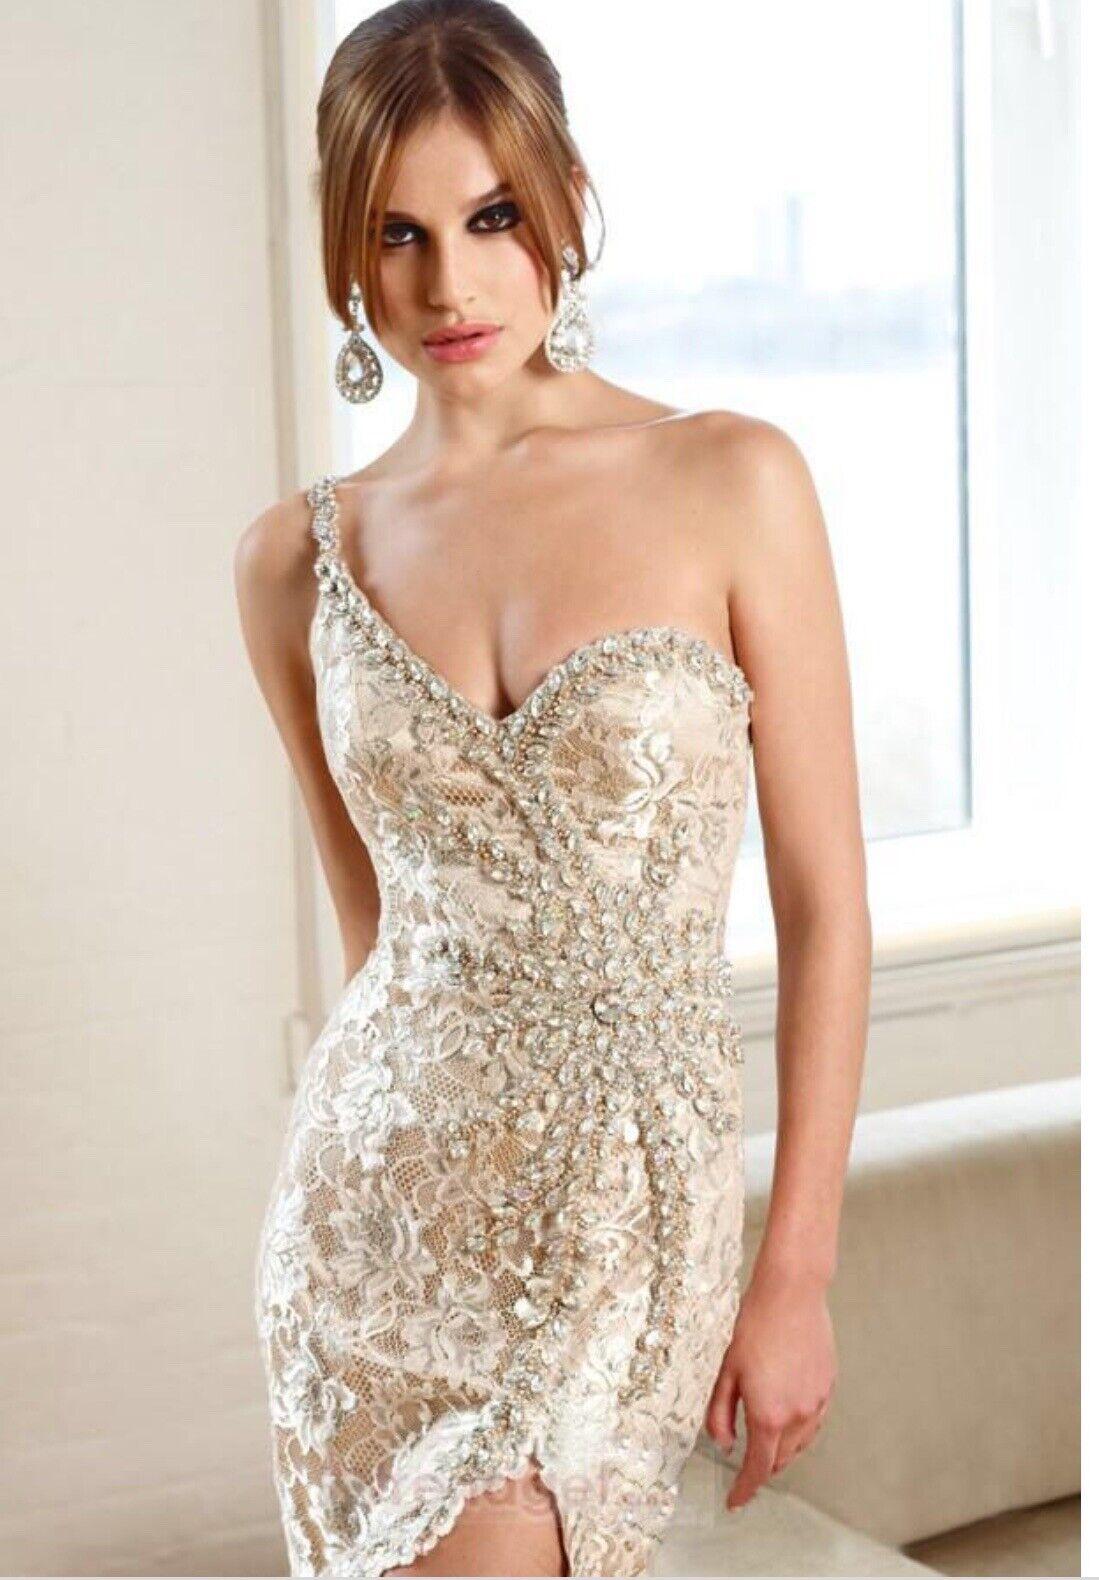 Terrani Couture Crystal Nude Dress Wedding Formal - image 1